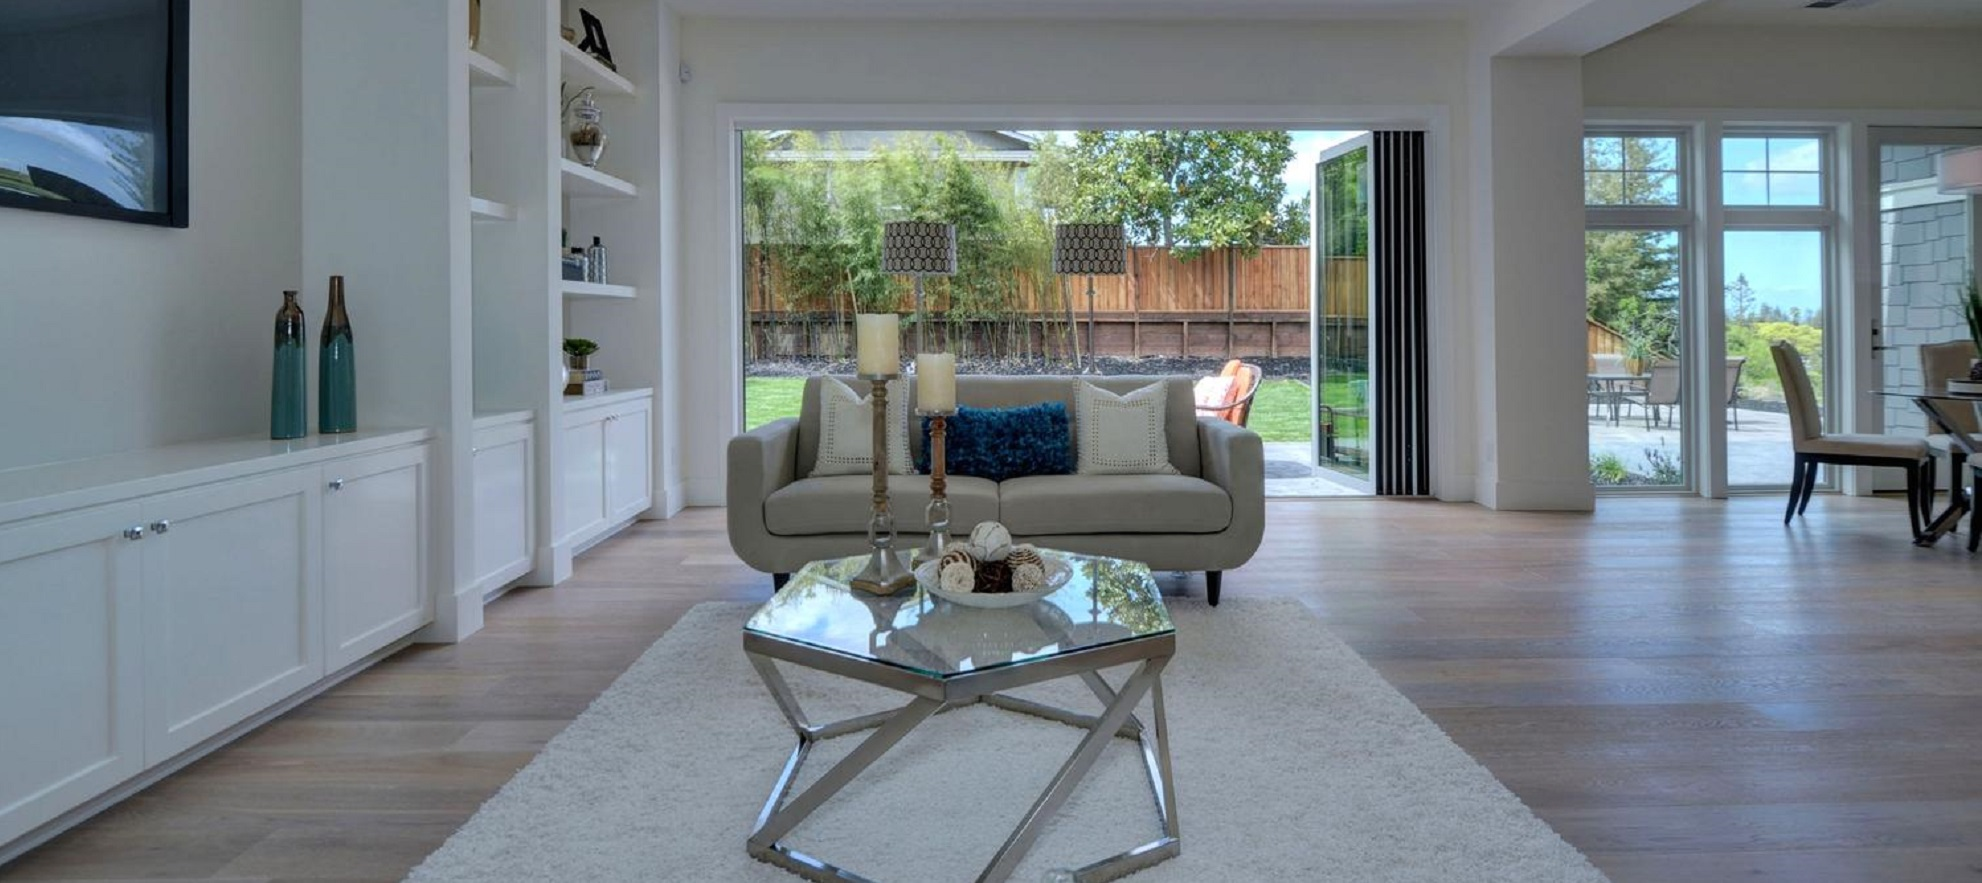 Luxury Listing: Sleek And Modern New Construction In Los Altos